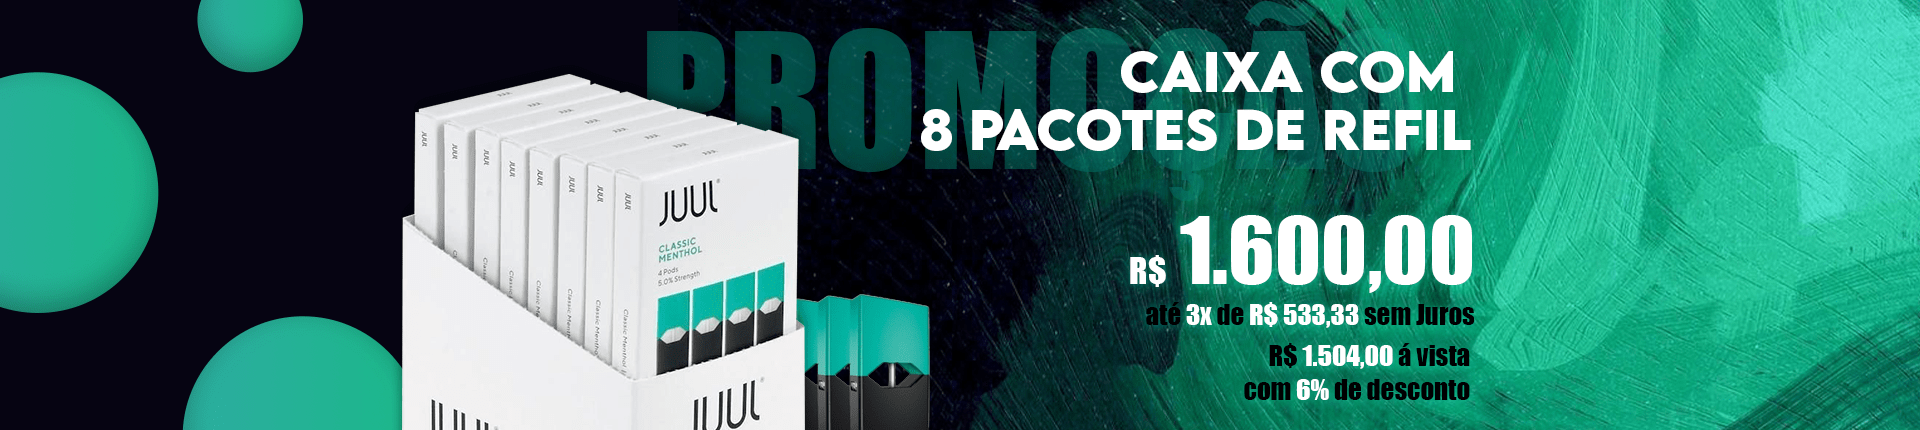 juul menthol 8 pack